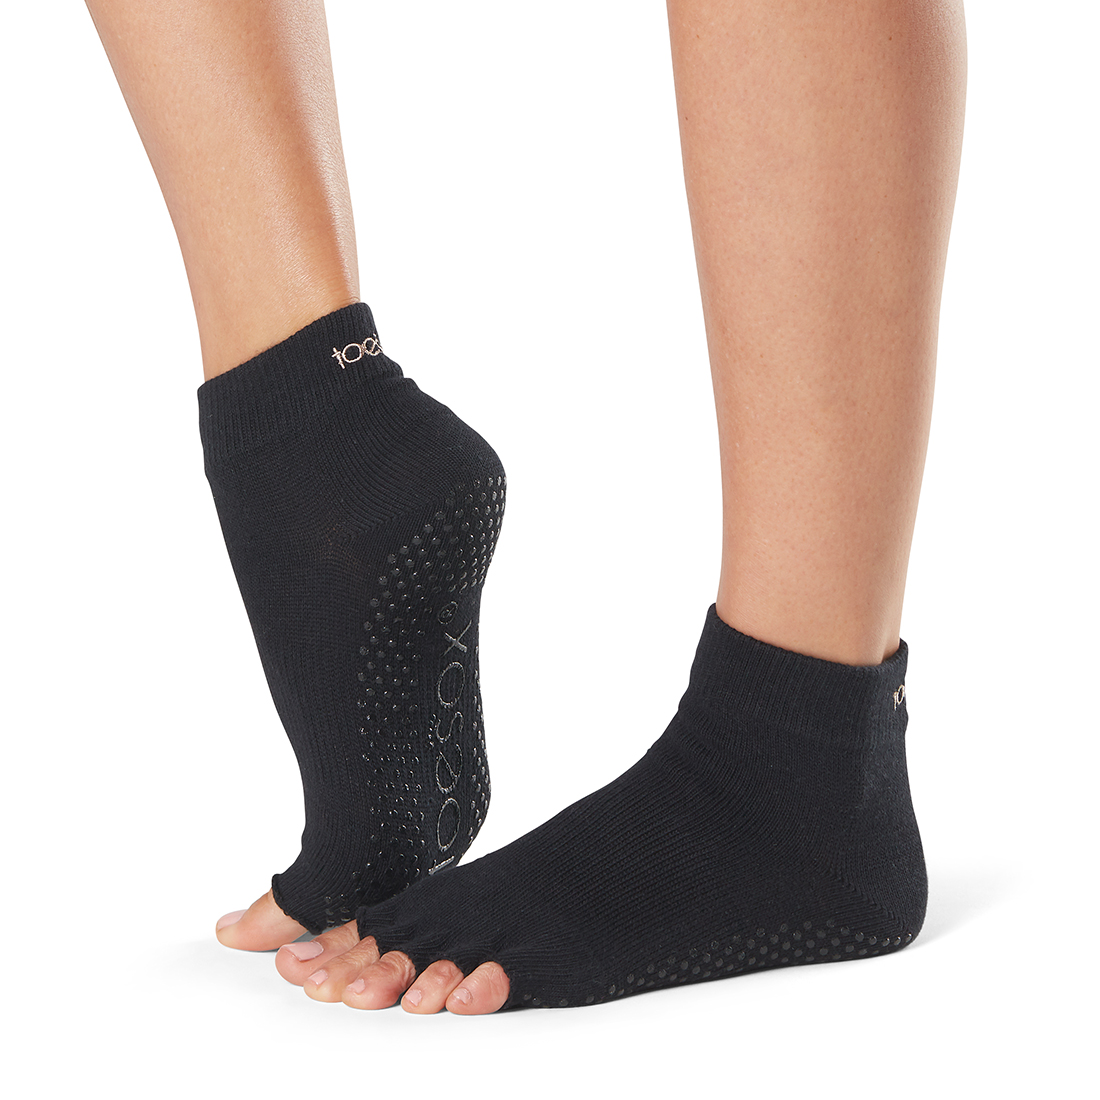 Yogasocken ToeSox Ankle Half Toe Black